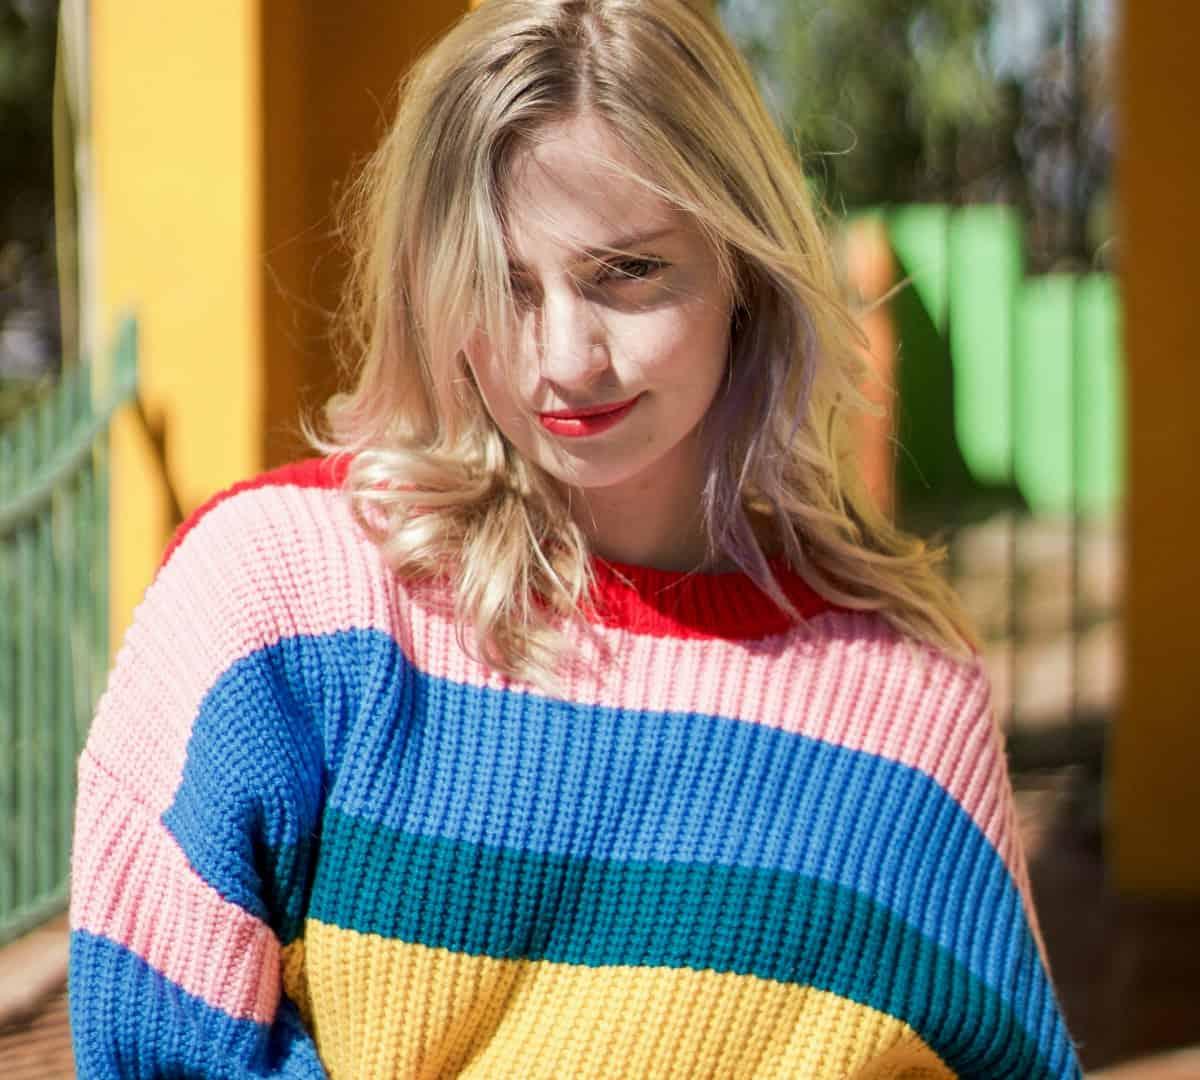 A trendy statement knit sweater